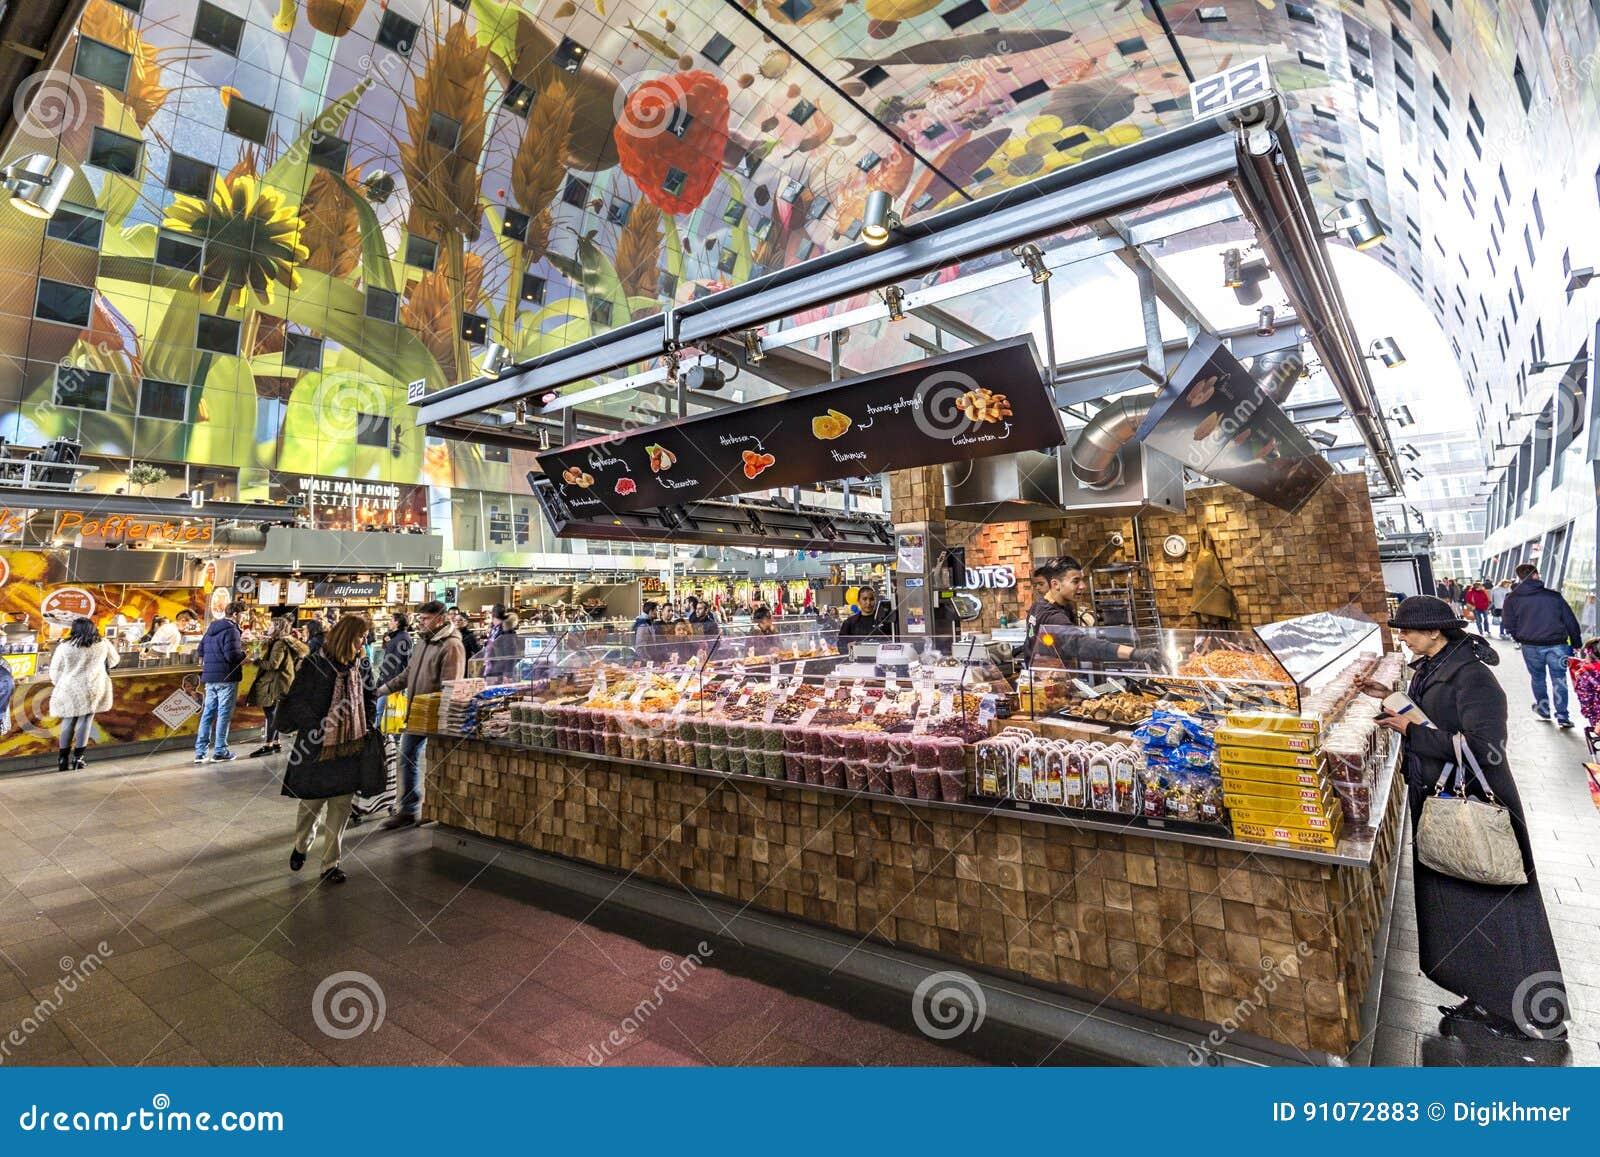 Rotterdam Market Hall building